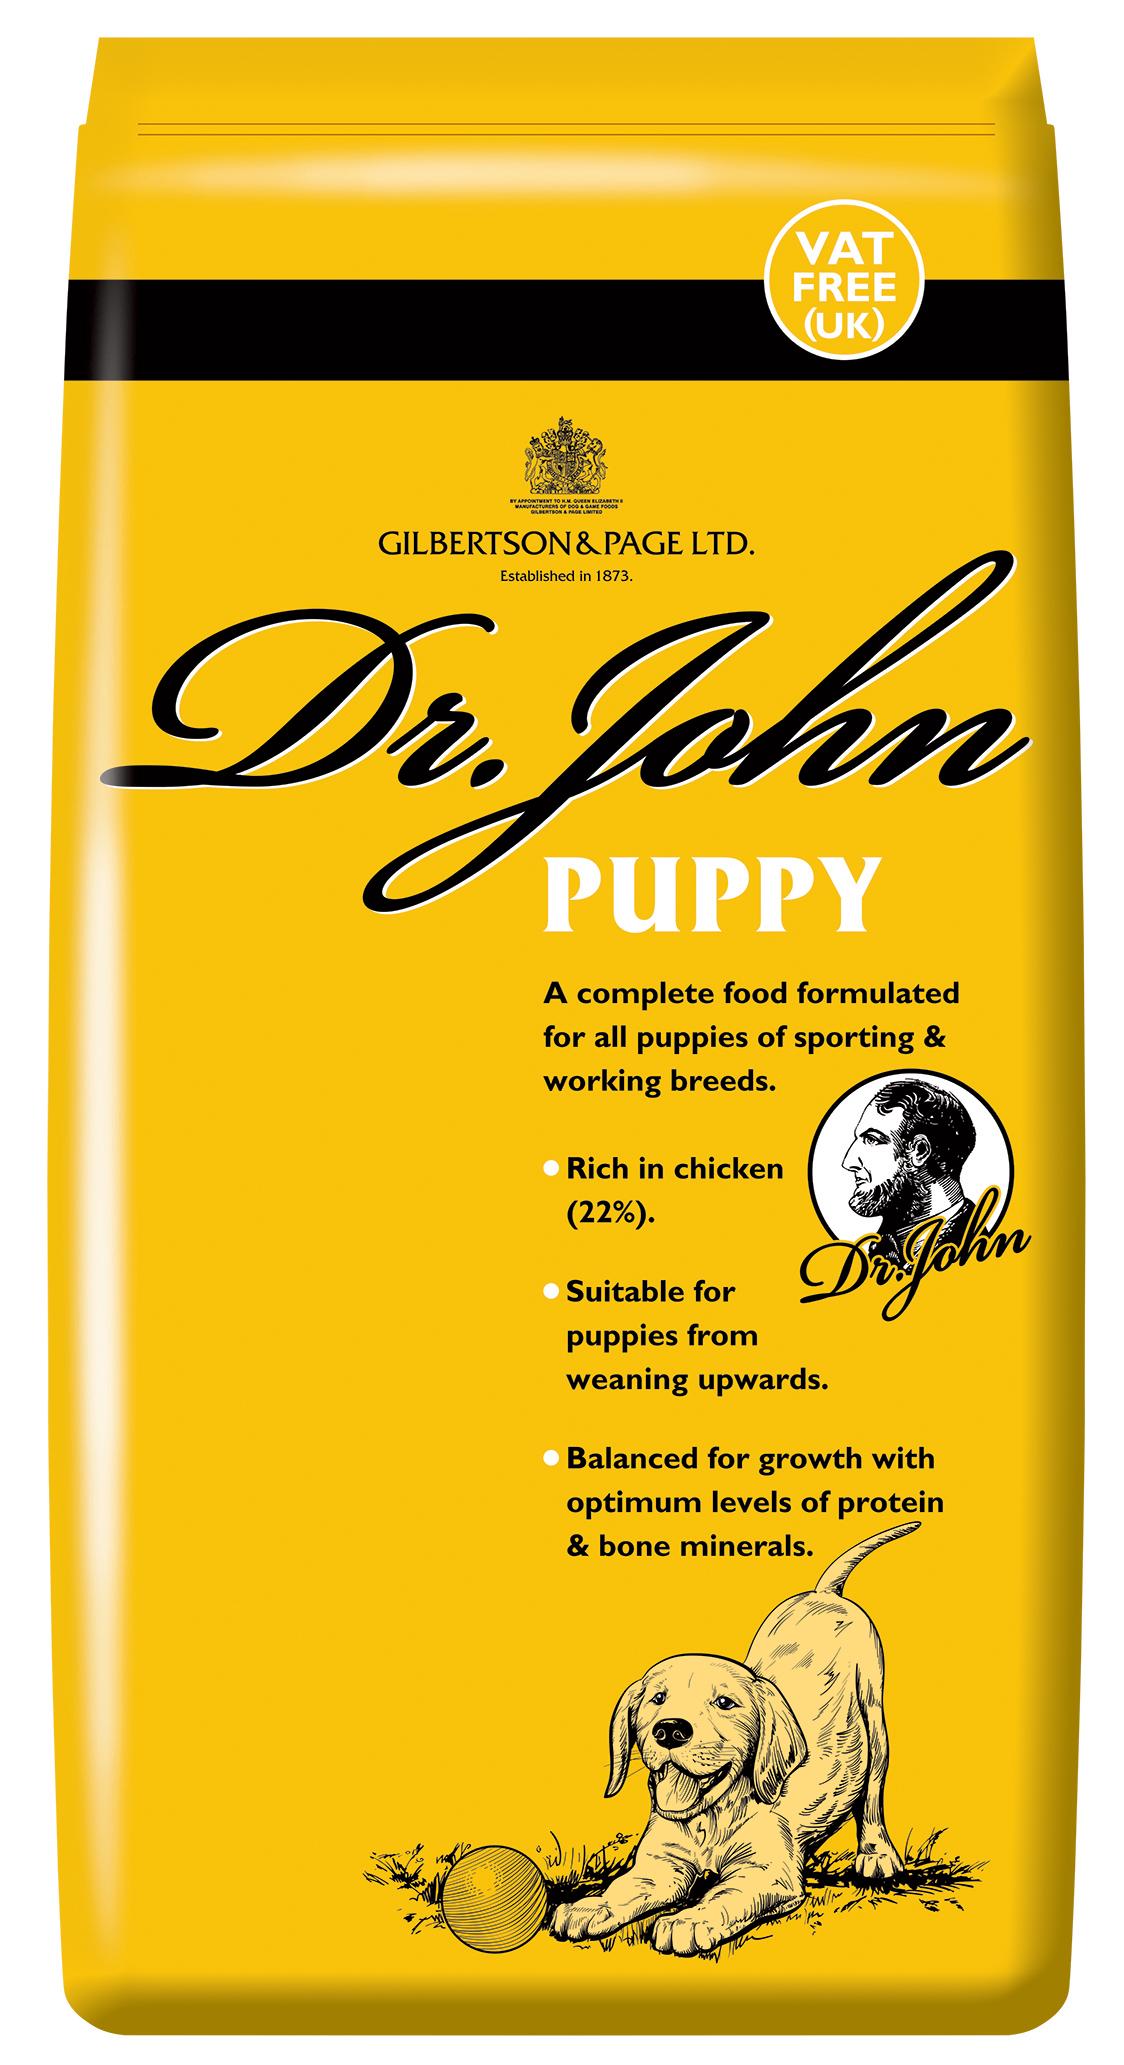 Dr John Puppy Dog Food